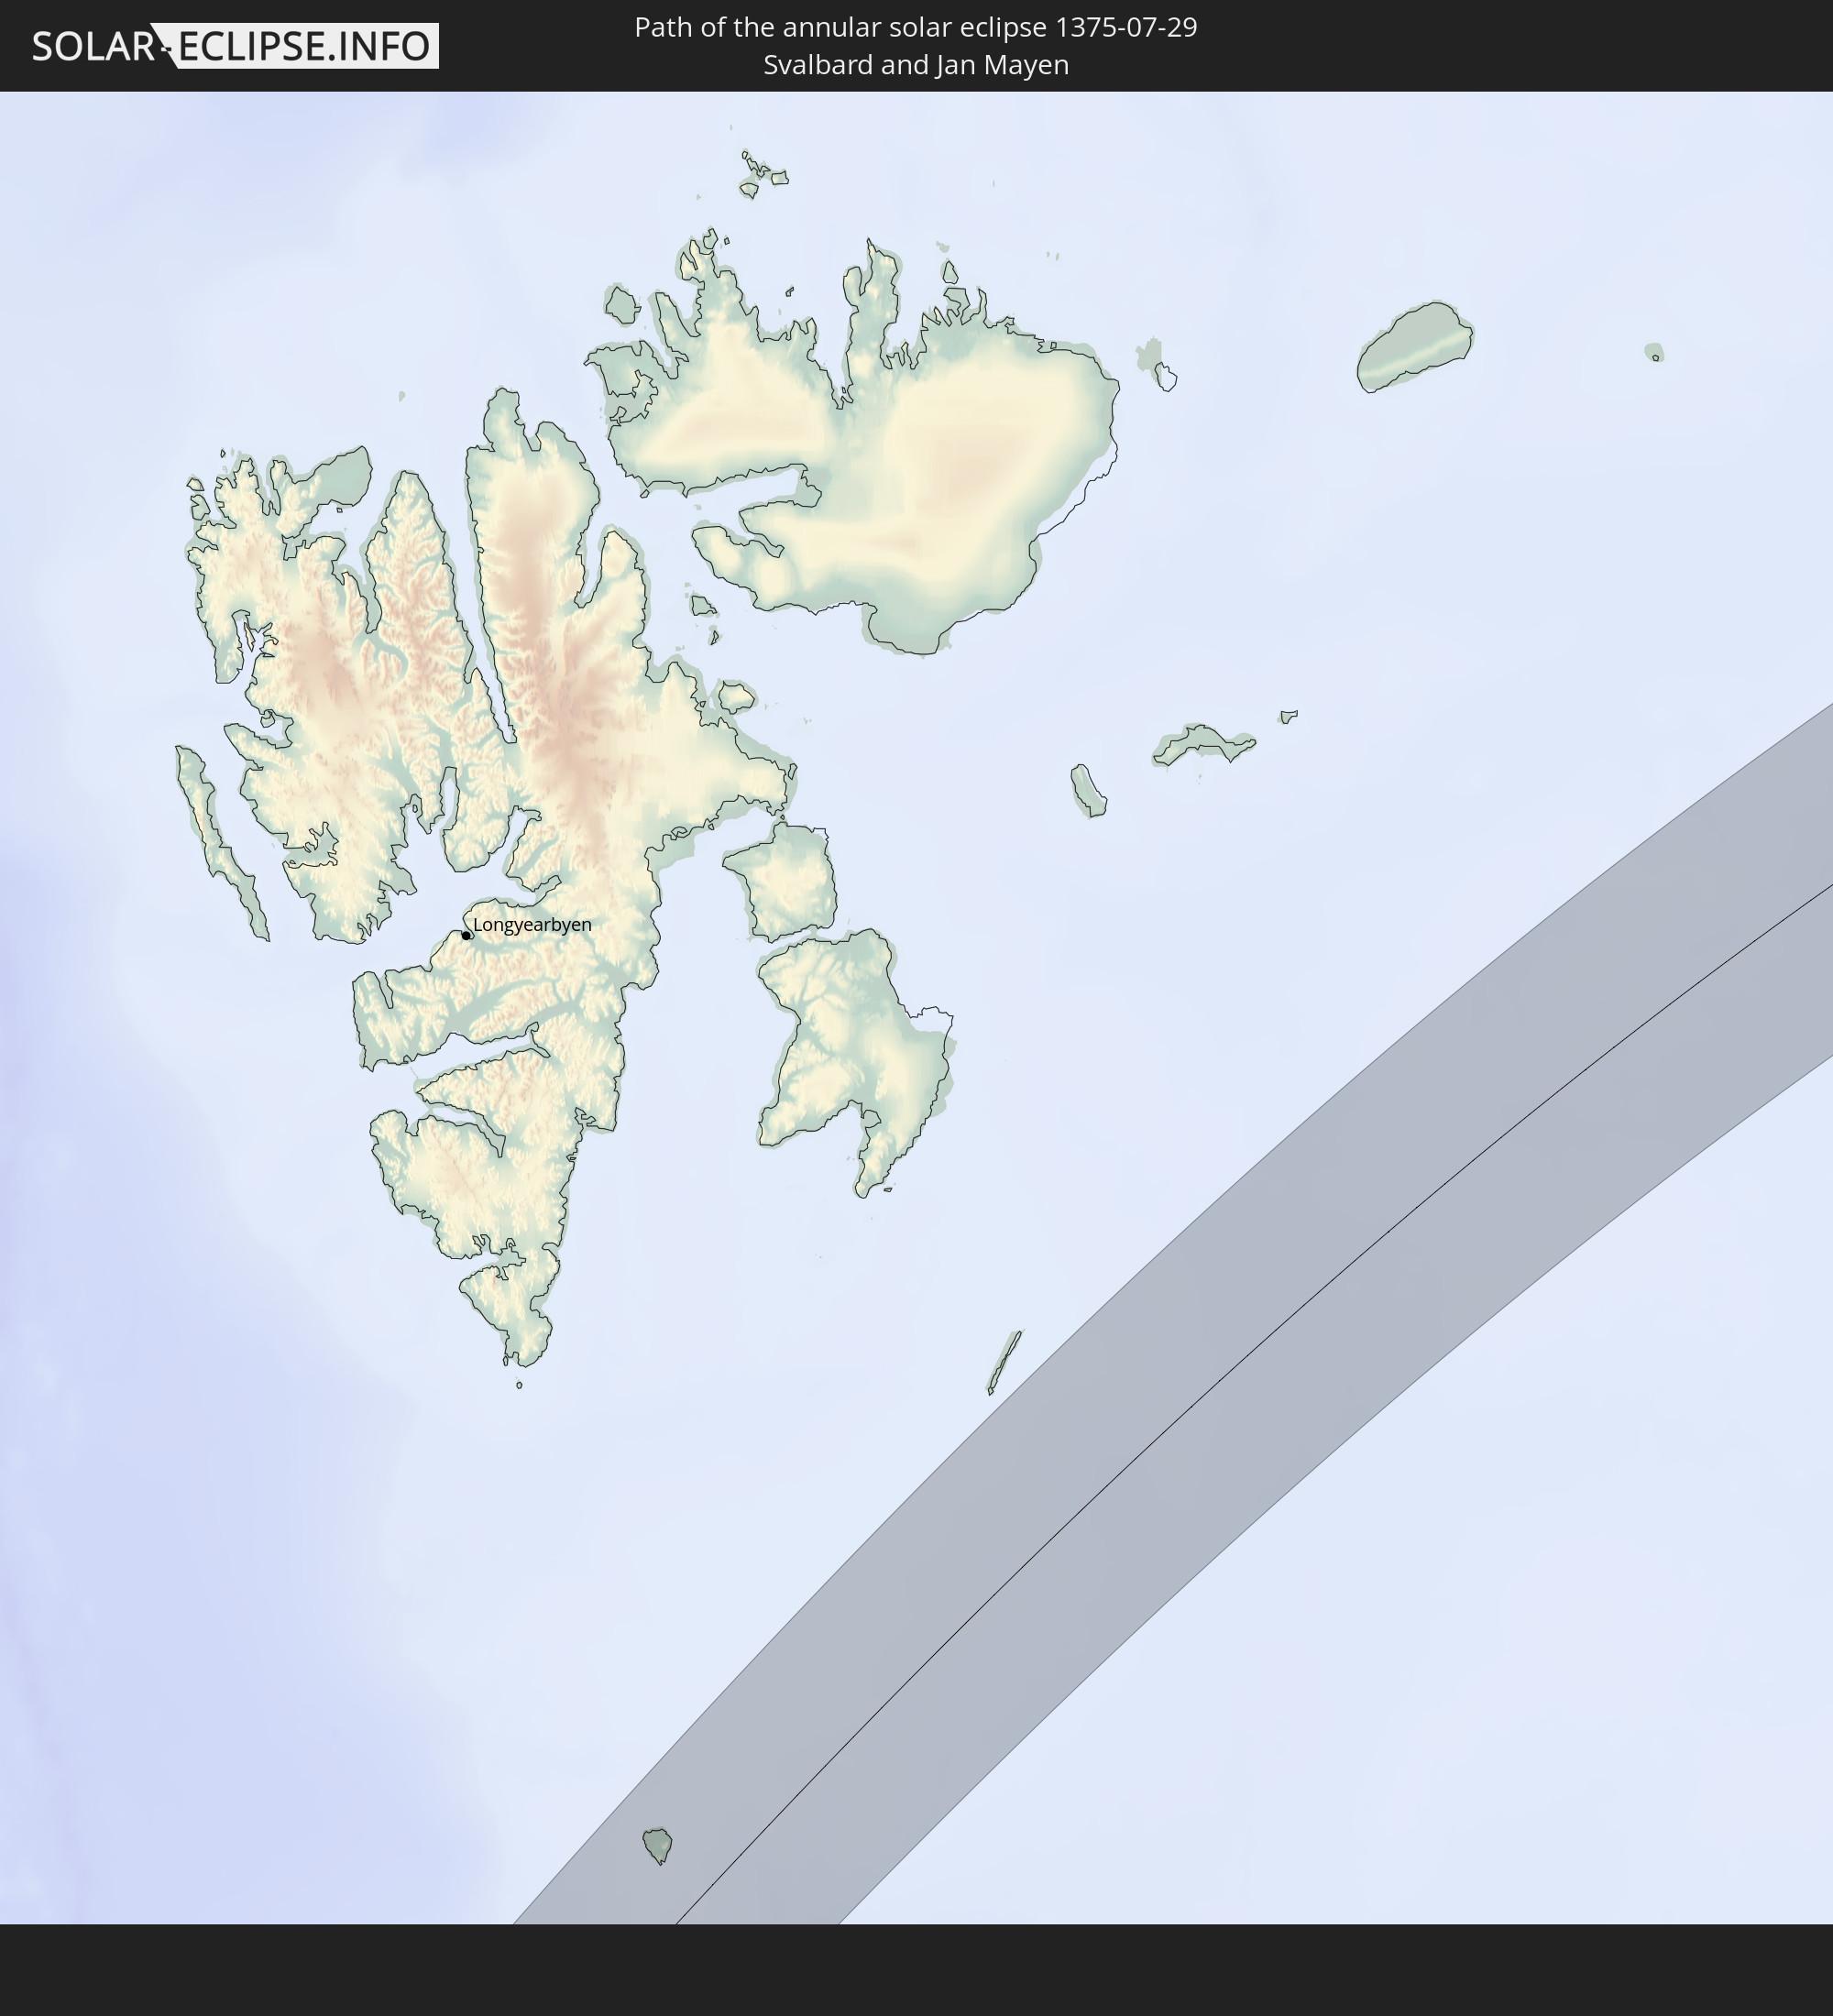 Annular solar eclipse of 07/29/1375